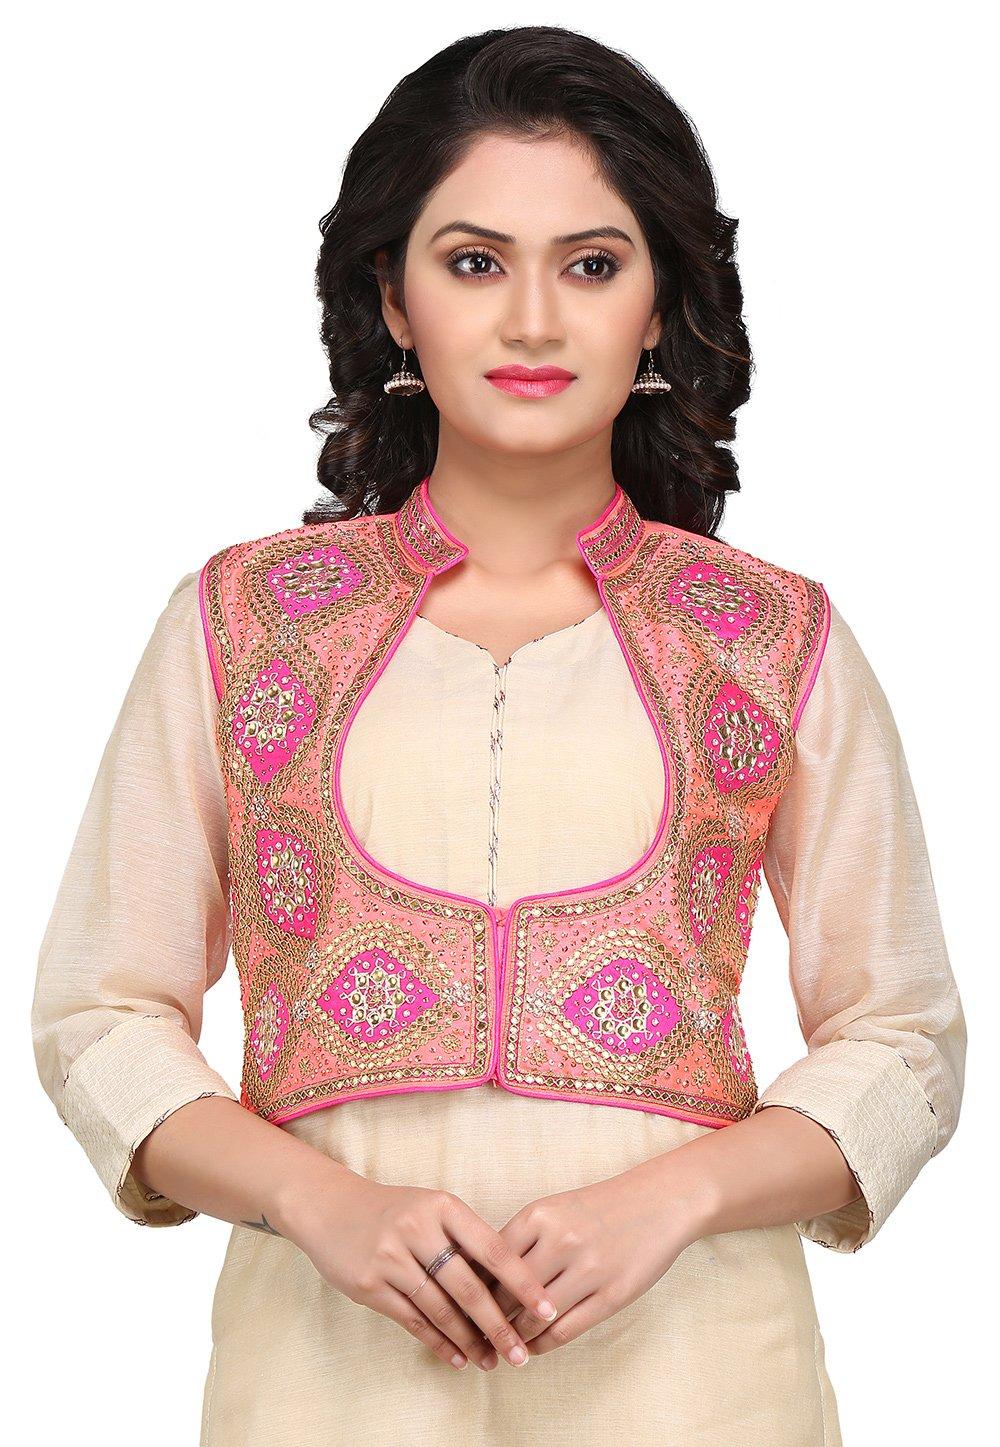 Utsav Fashion Gota Patti Embroidered Dupion Silk Jacket in Pink by Utsav Fashion